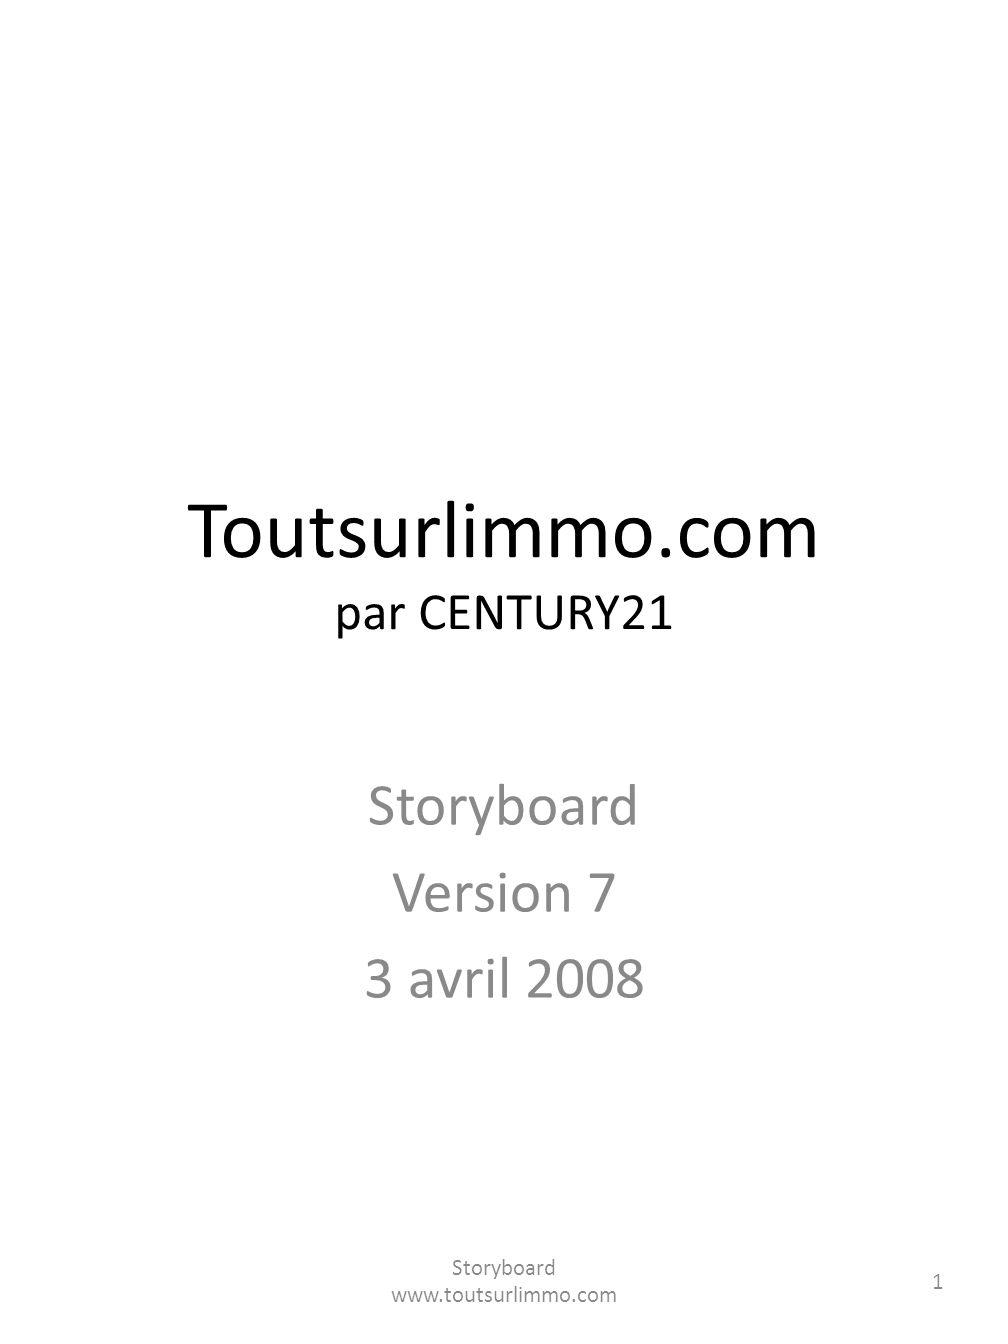 Toutsurlimmo.com par CENTURY21 Storyboard Version 7 3 avril 2008 Storyboard www.toutsurlimmo.com 1